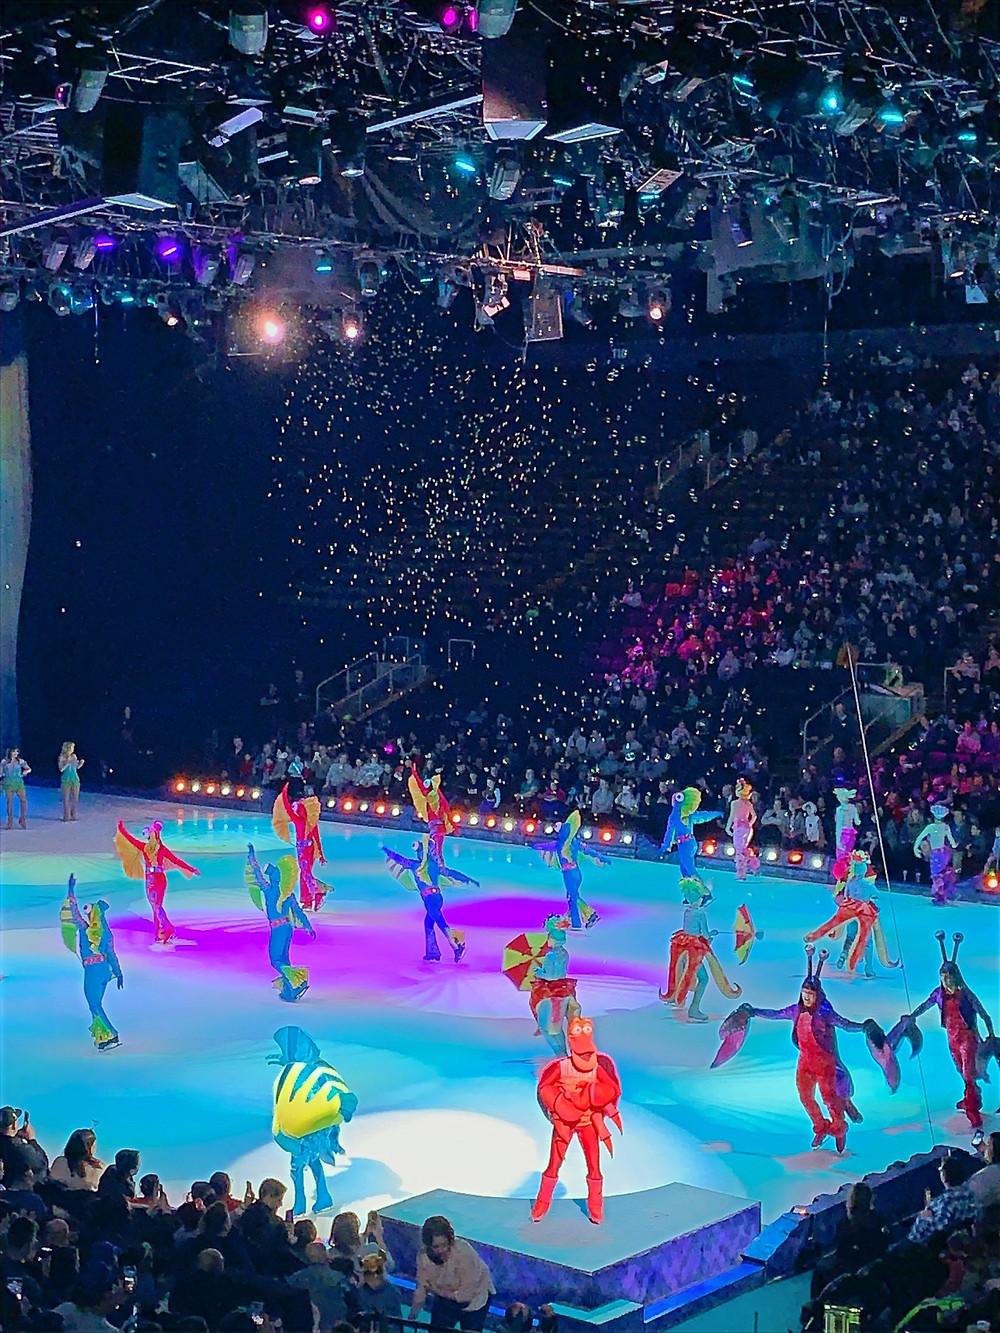 The Little Mermaid performance at Disney on Ice in Toronto, Ontario.